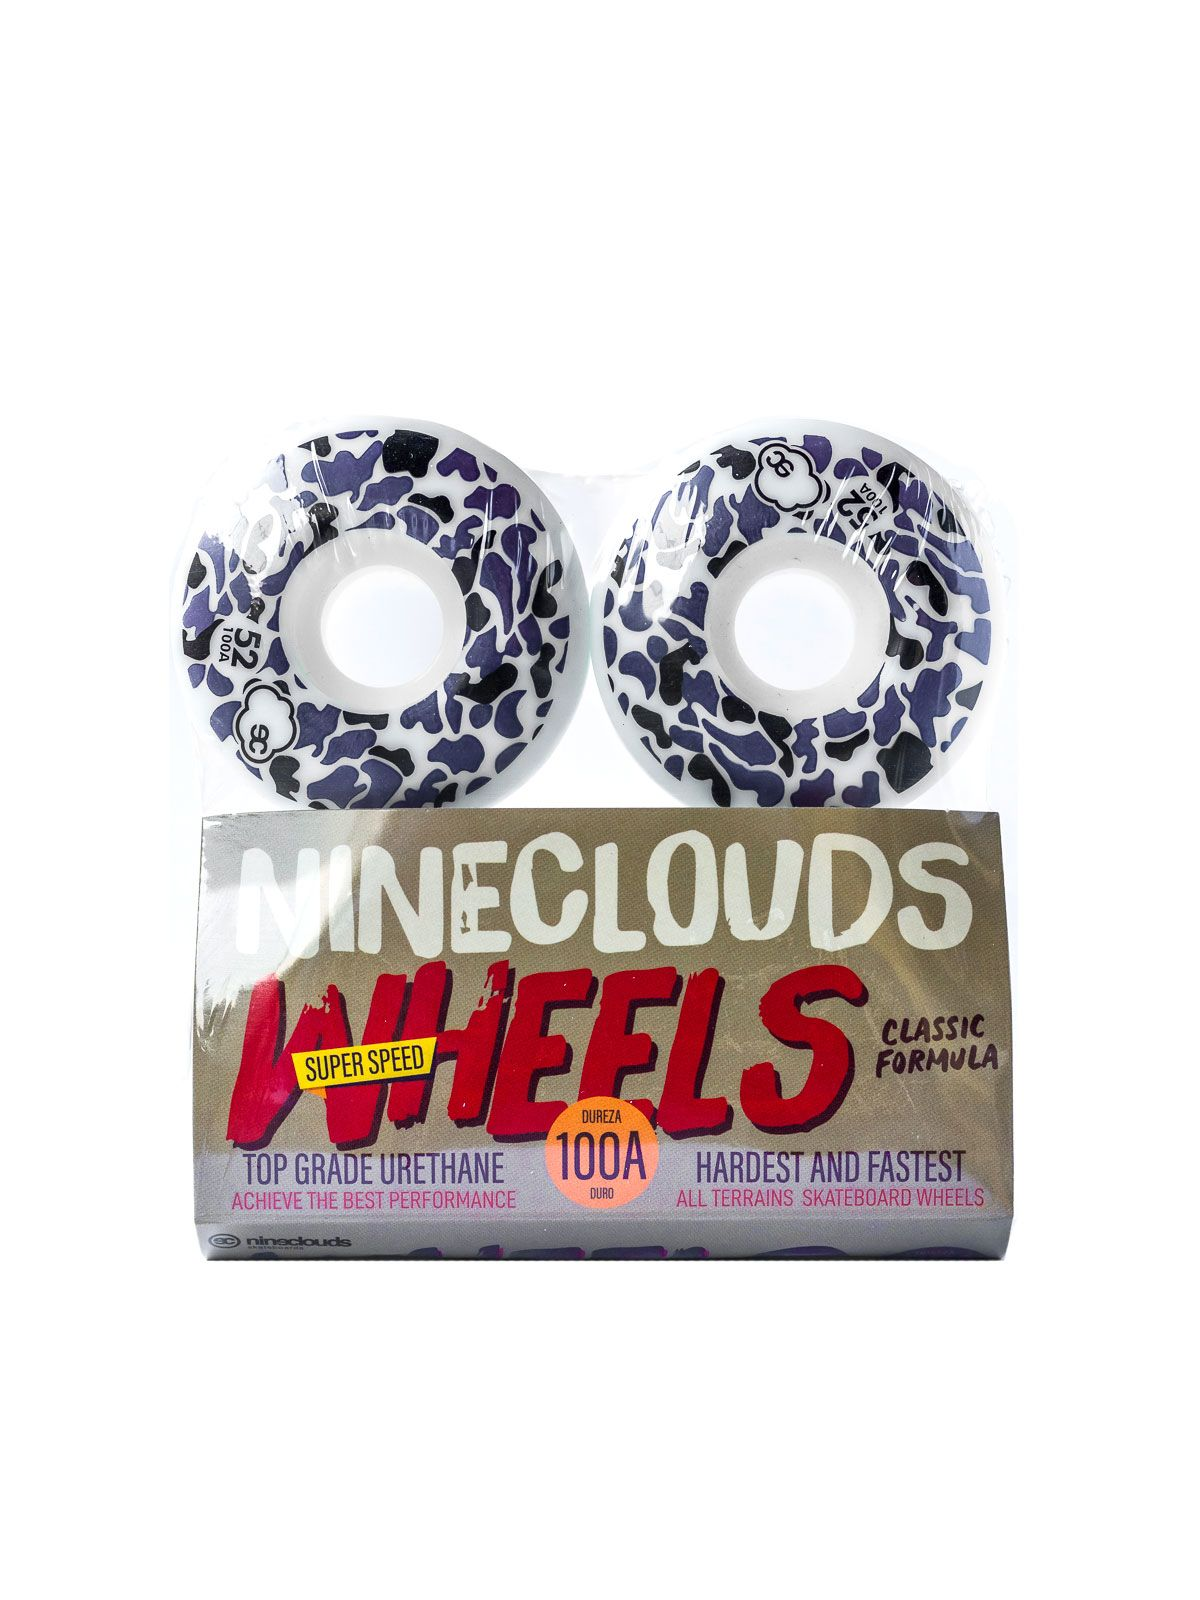 rodas-nineclouds-camo-52-2-image